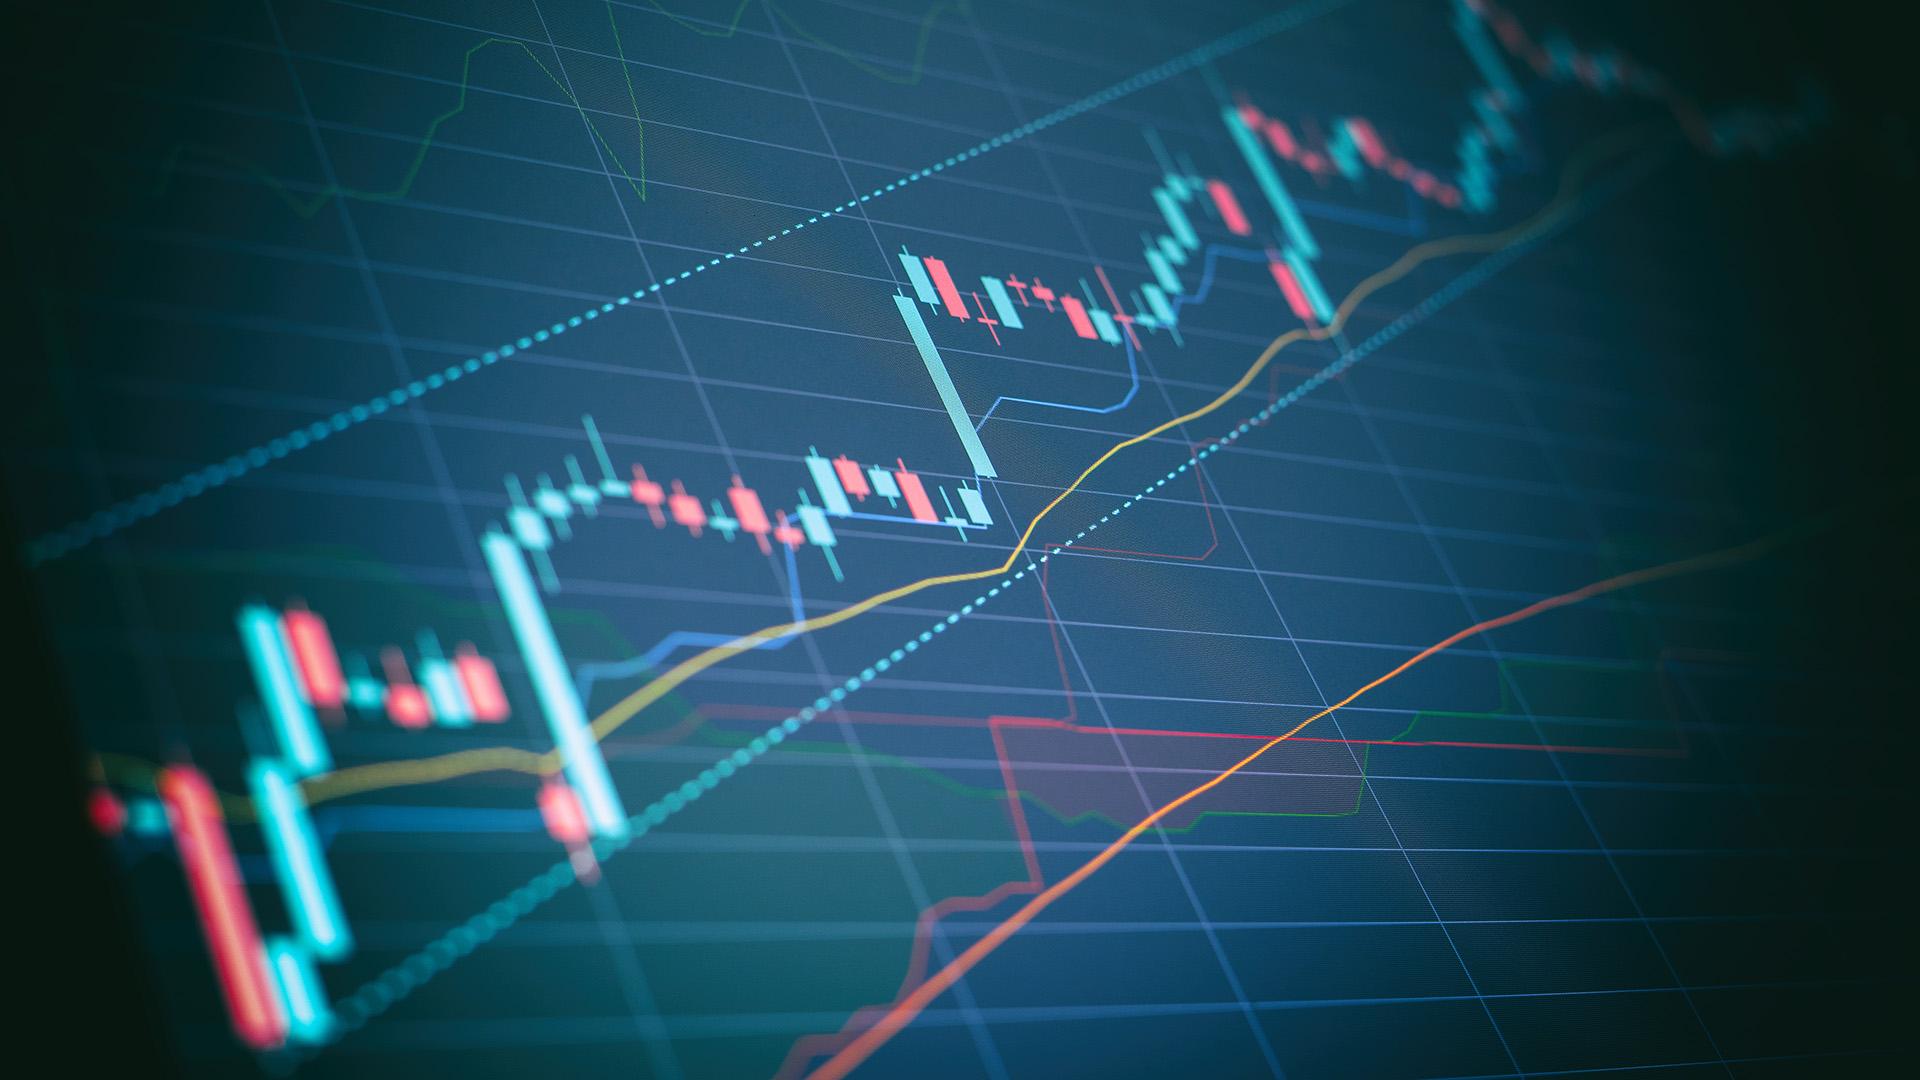 US: Federal Reserve expands/extends Municipal Liquidity Facility